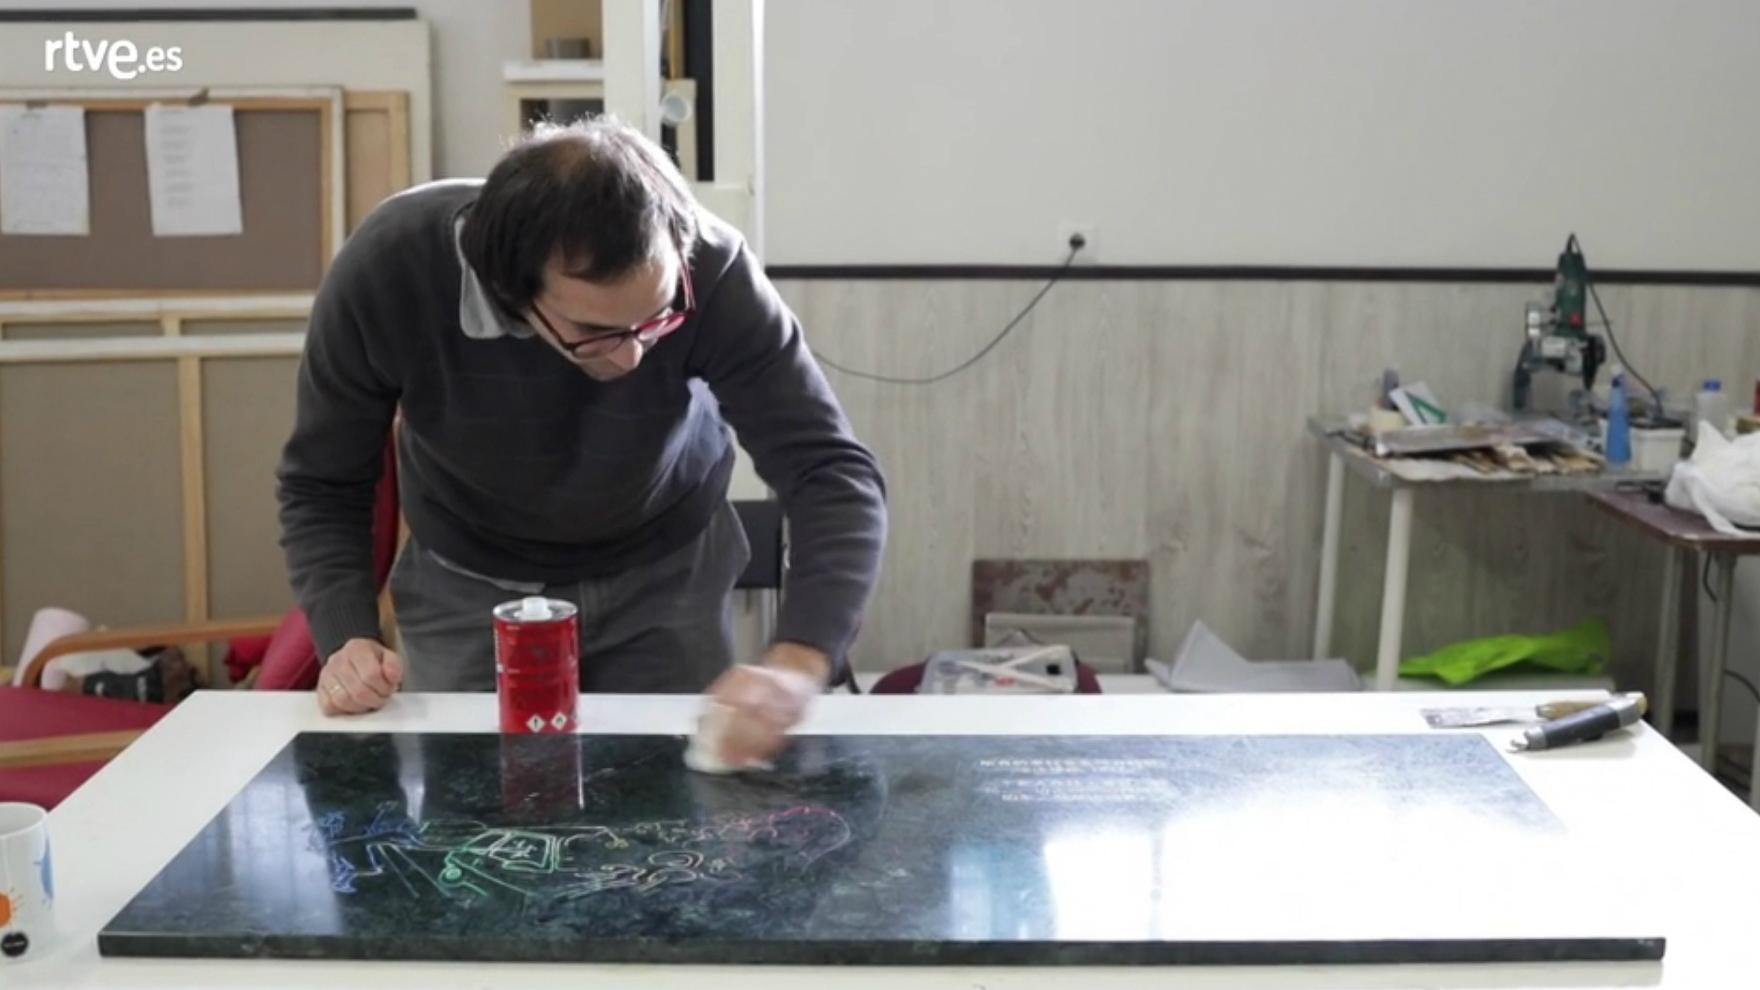 Desatados - Daniel Silvo, Artista multidisciplinar